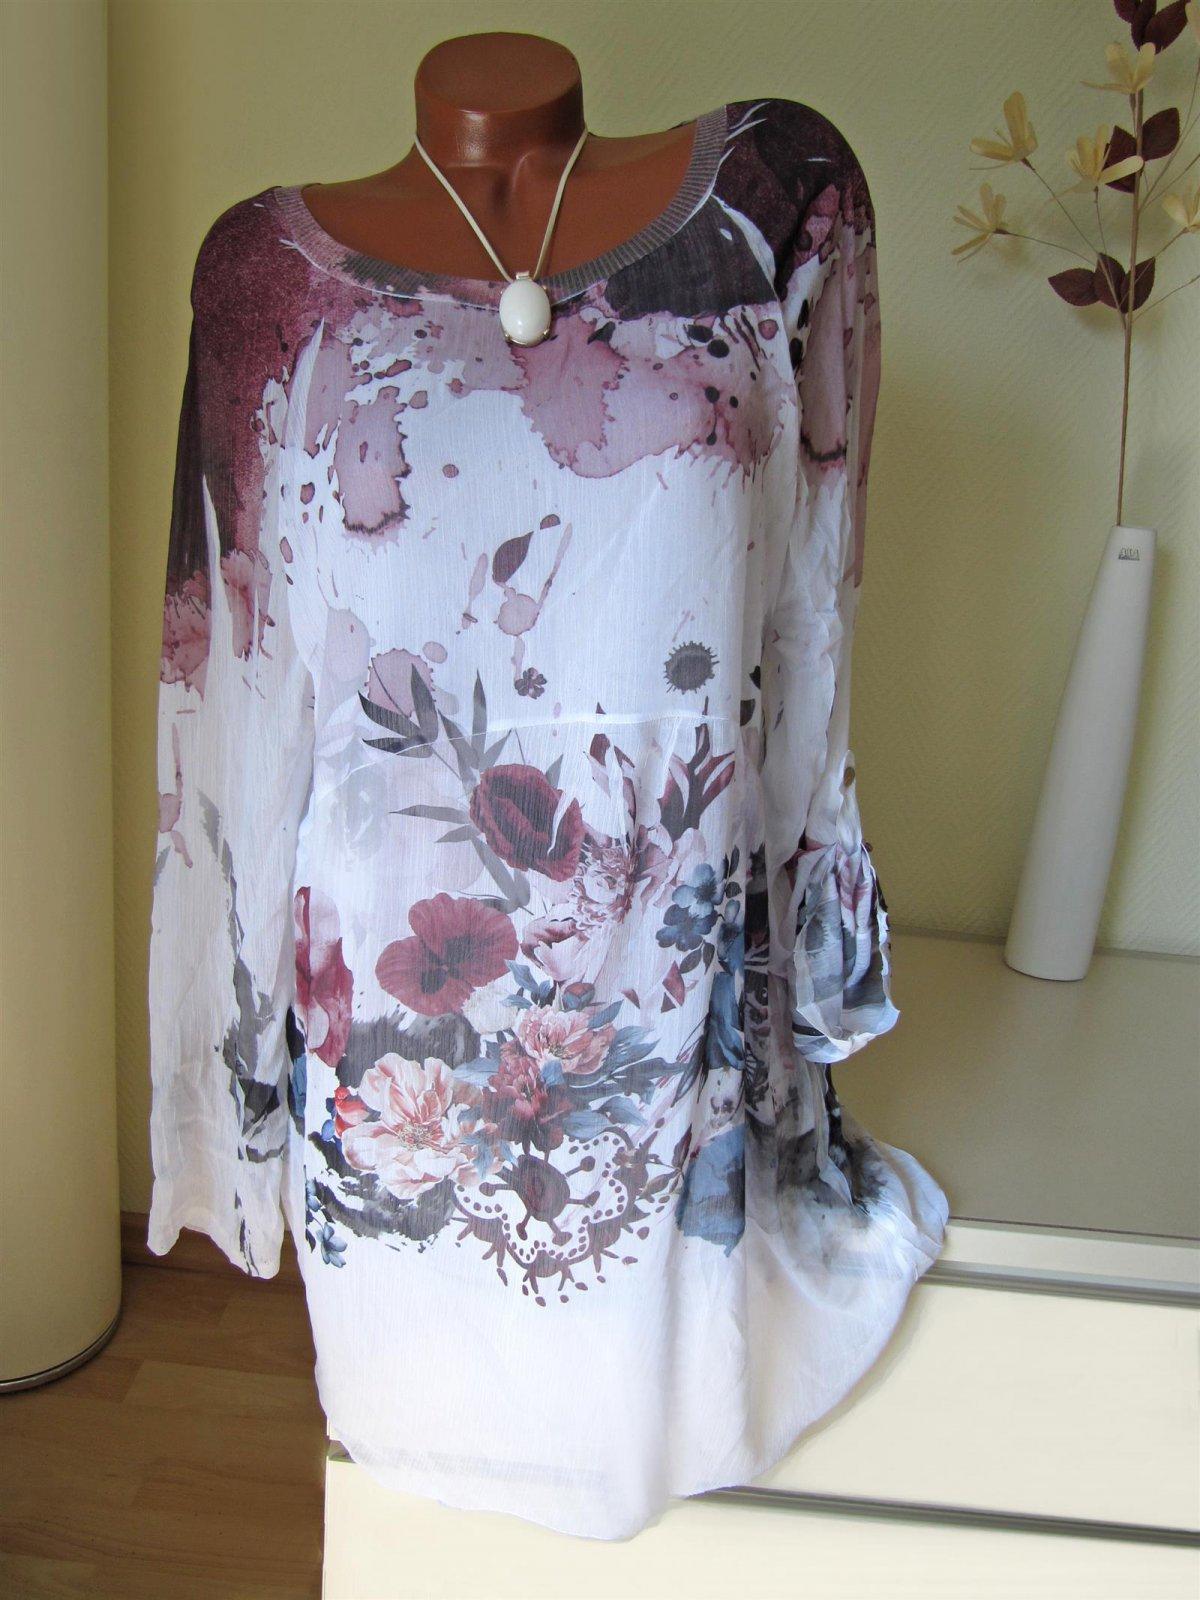 Romantik Oversize Vintage Tunika Kleid Blumen Batik A-Form 40 42 44,